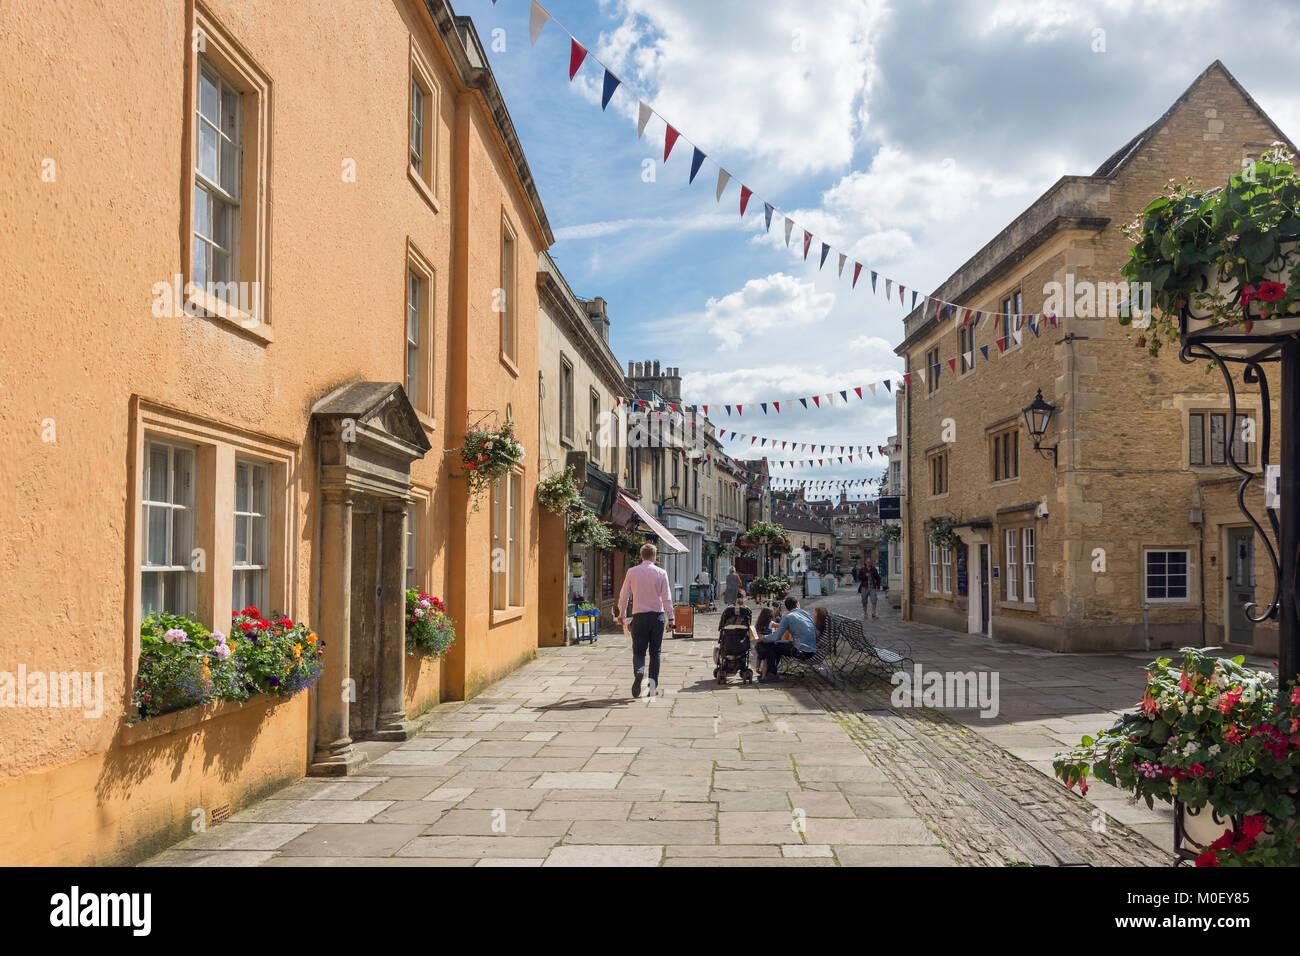 Pedestrianised High Street, Corsham, Wiltshire, England, United Kingdom Stock Photo